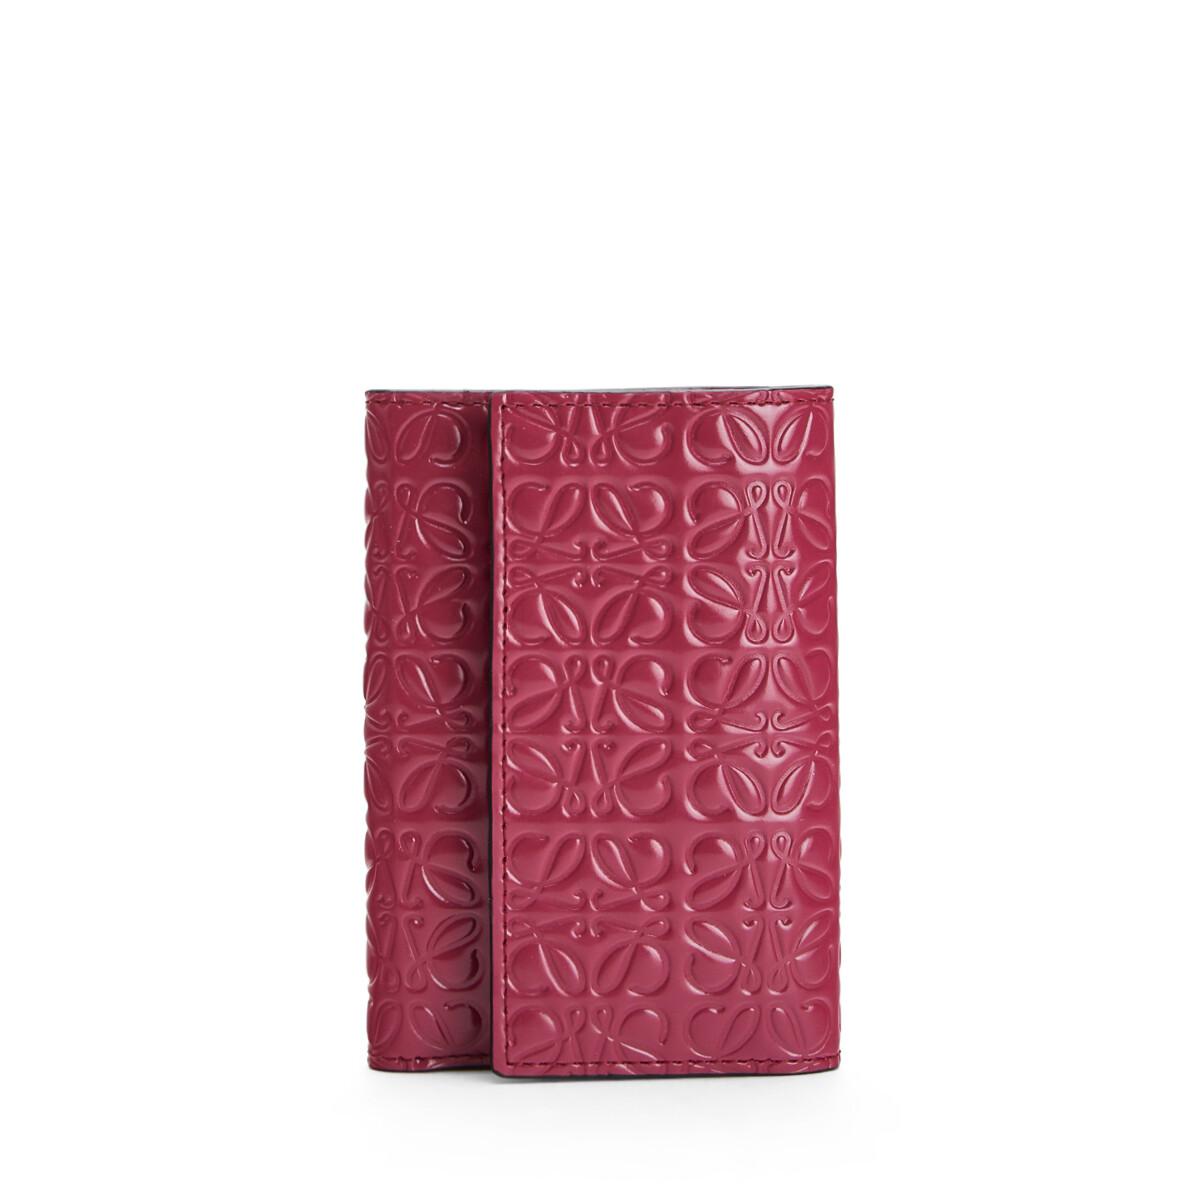 LOEWE Small Vertical Wallet ラズベリー front